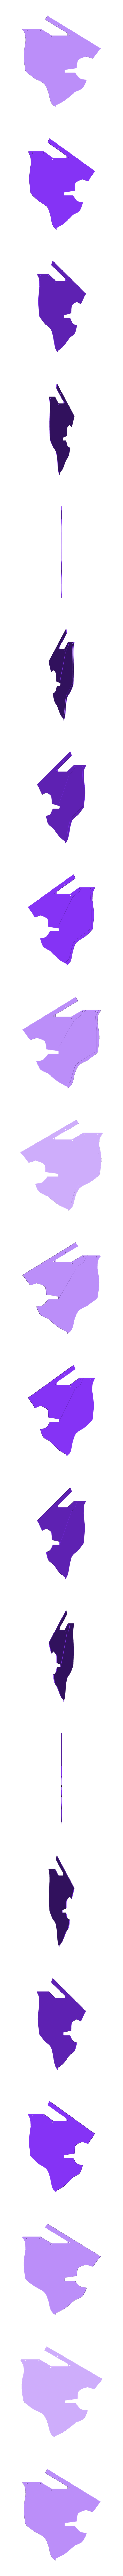 blade_btm1.stl Download free STL file Guardian Shield+ Zelda Breath of the Wild • 3D print object, Adafruit